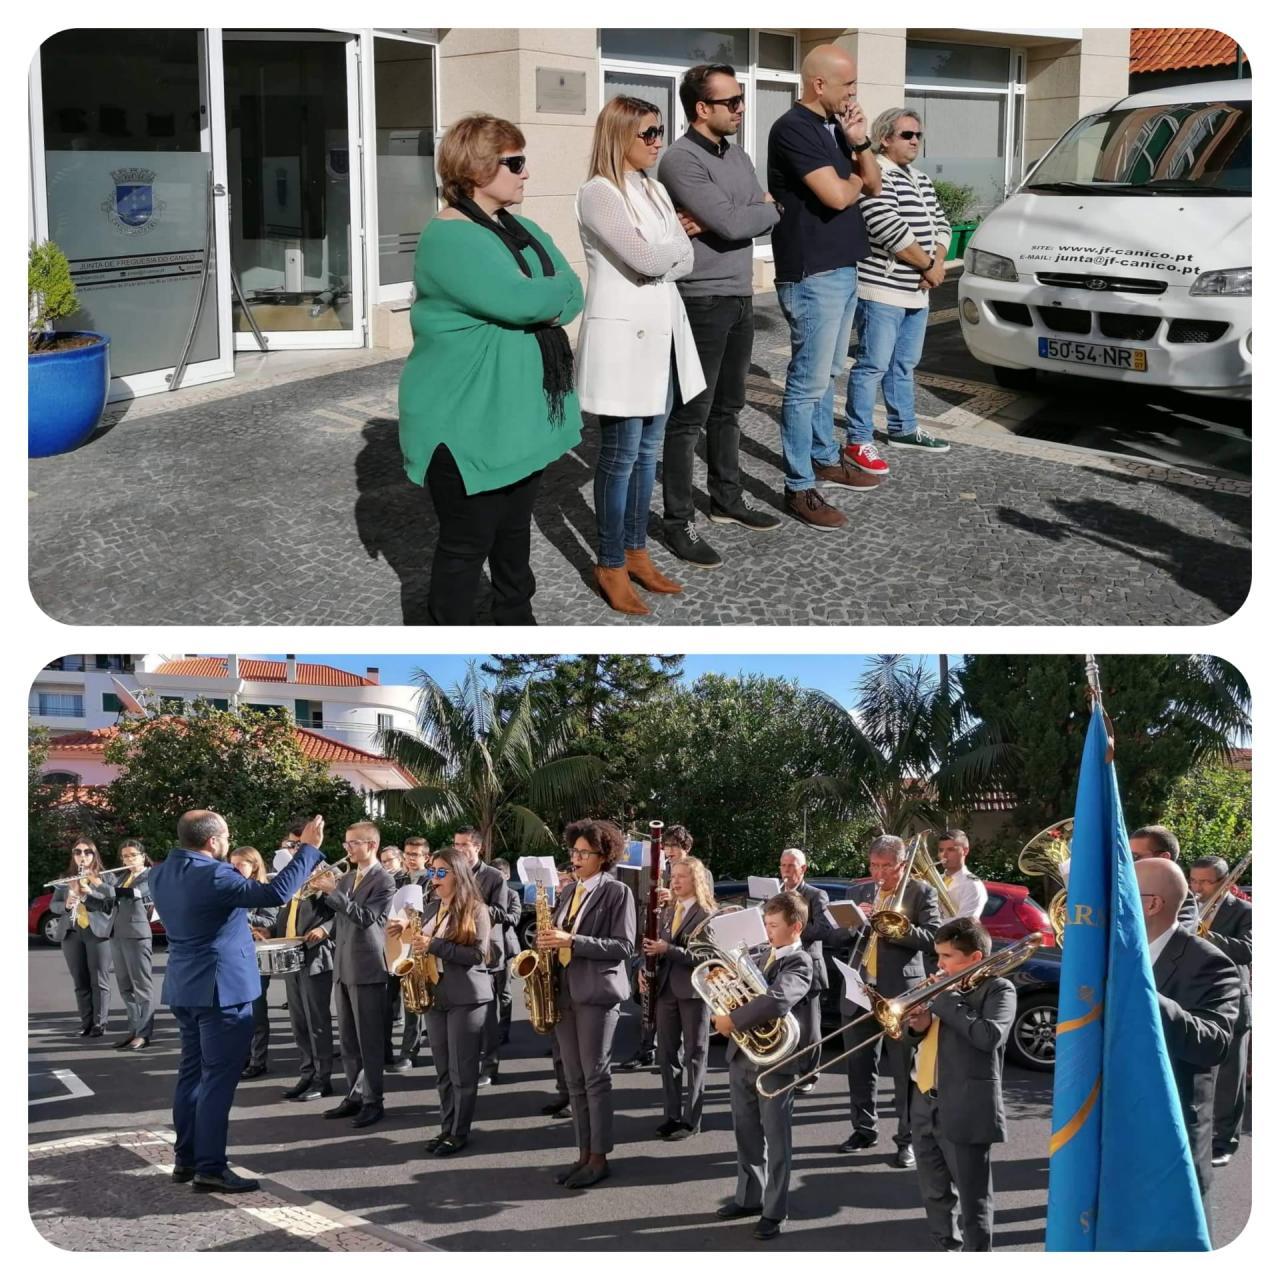 Visita da Banda Filarmónica do Caniço e Eiras